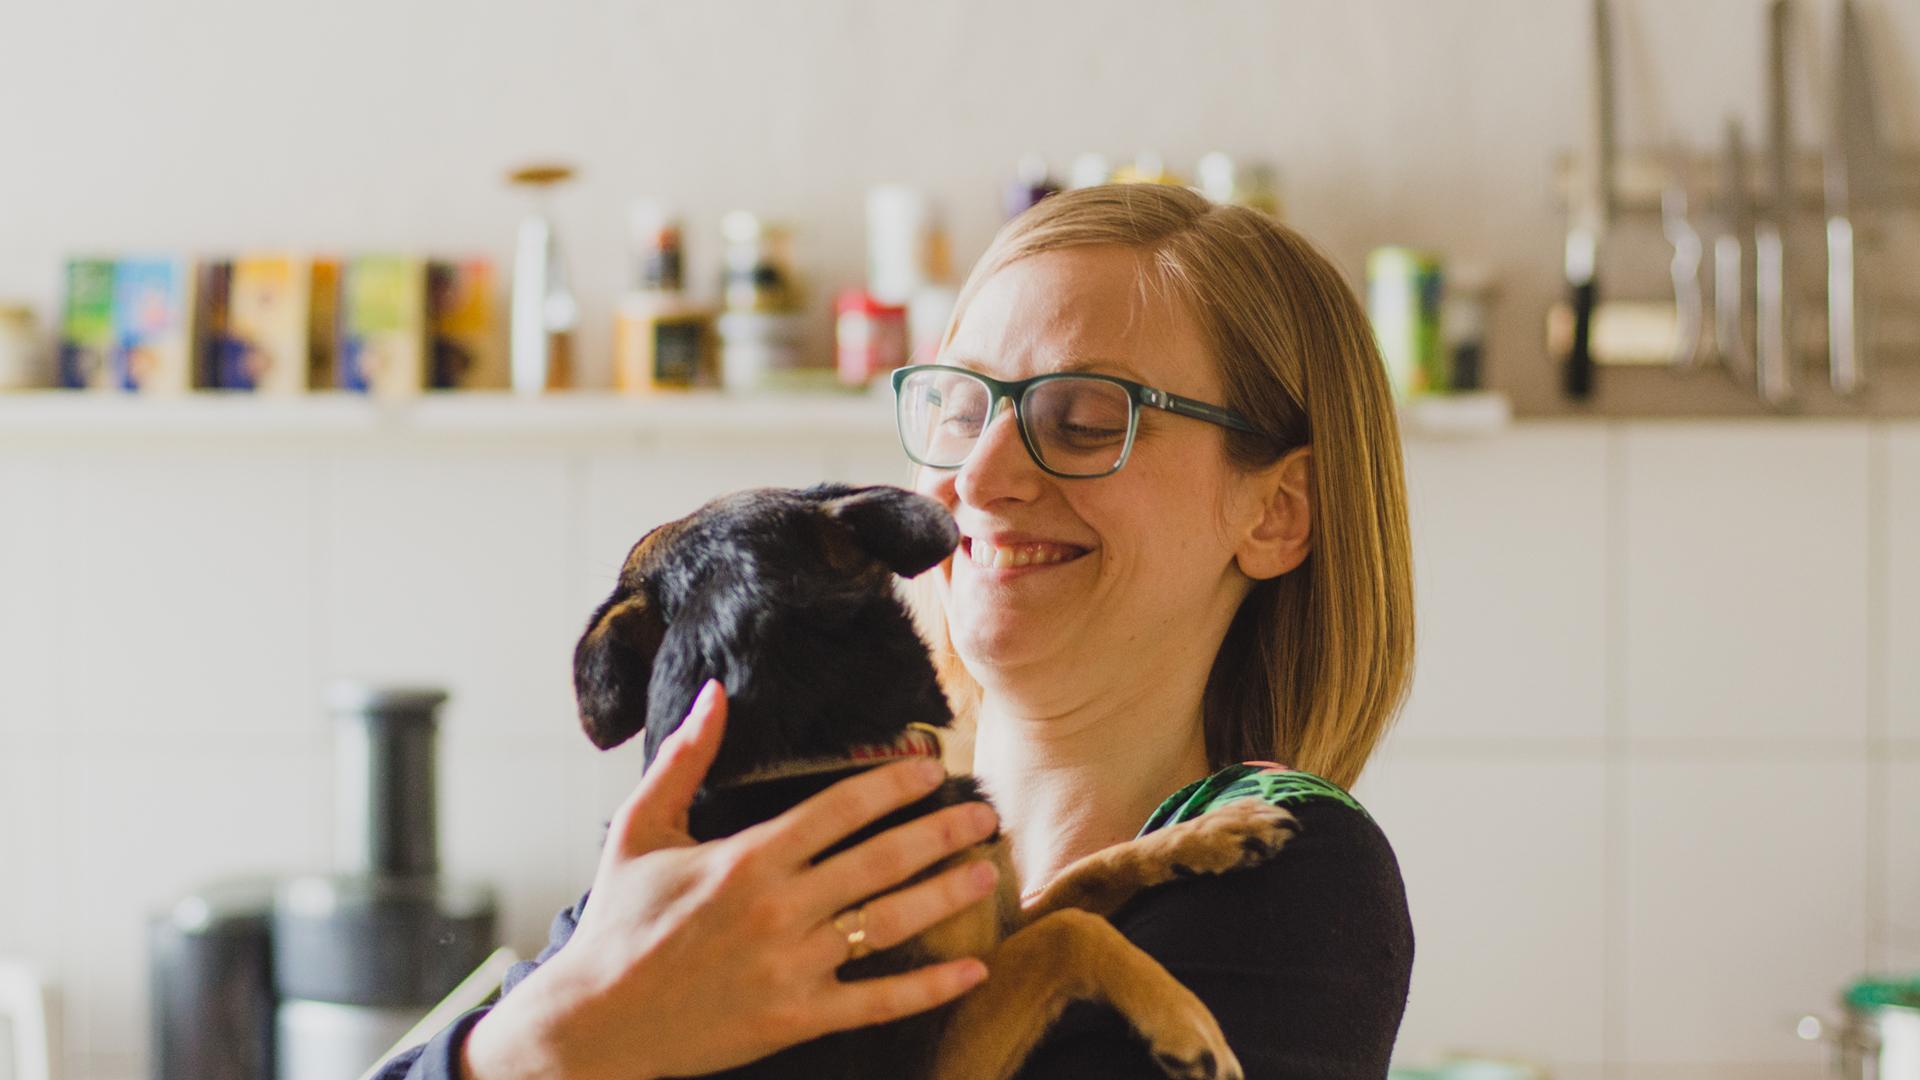 Yoga Teacher, Isabella Paulsen with her dog.